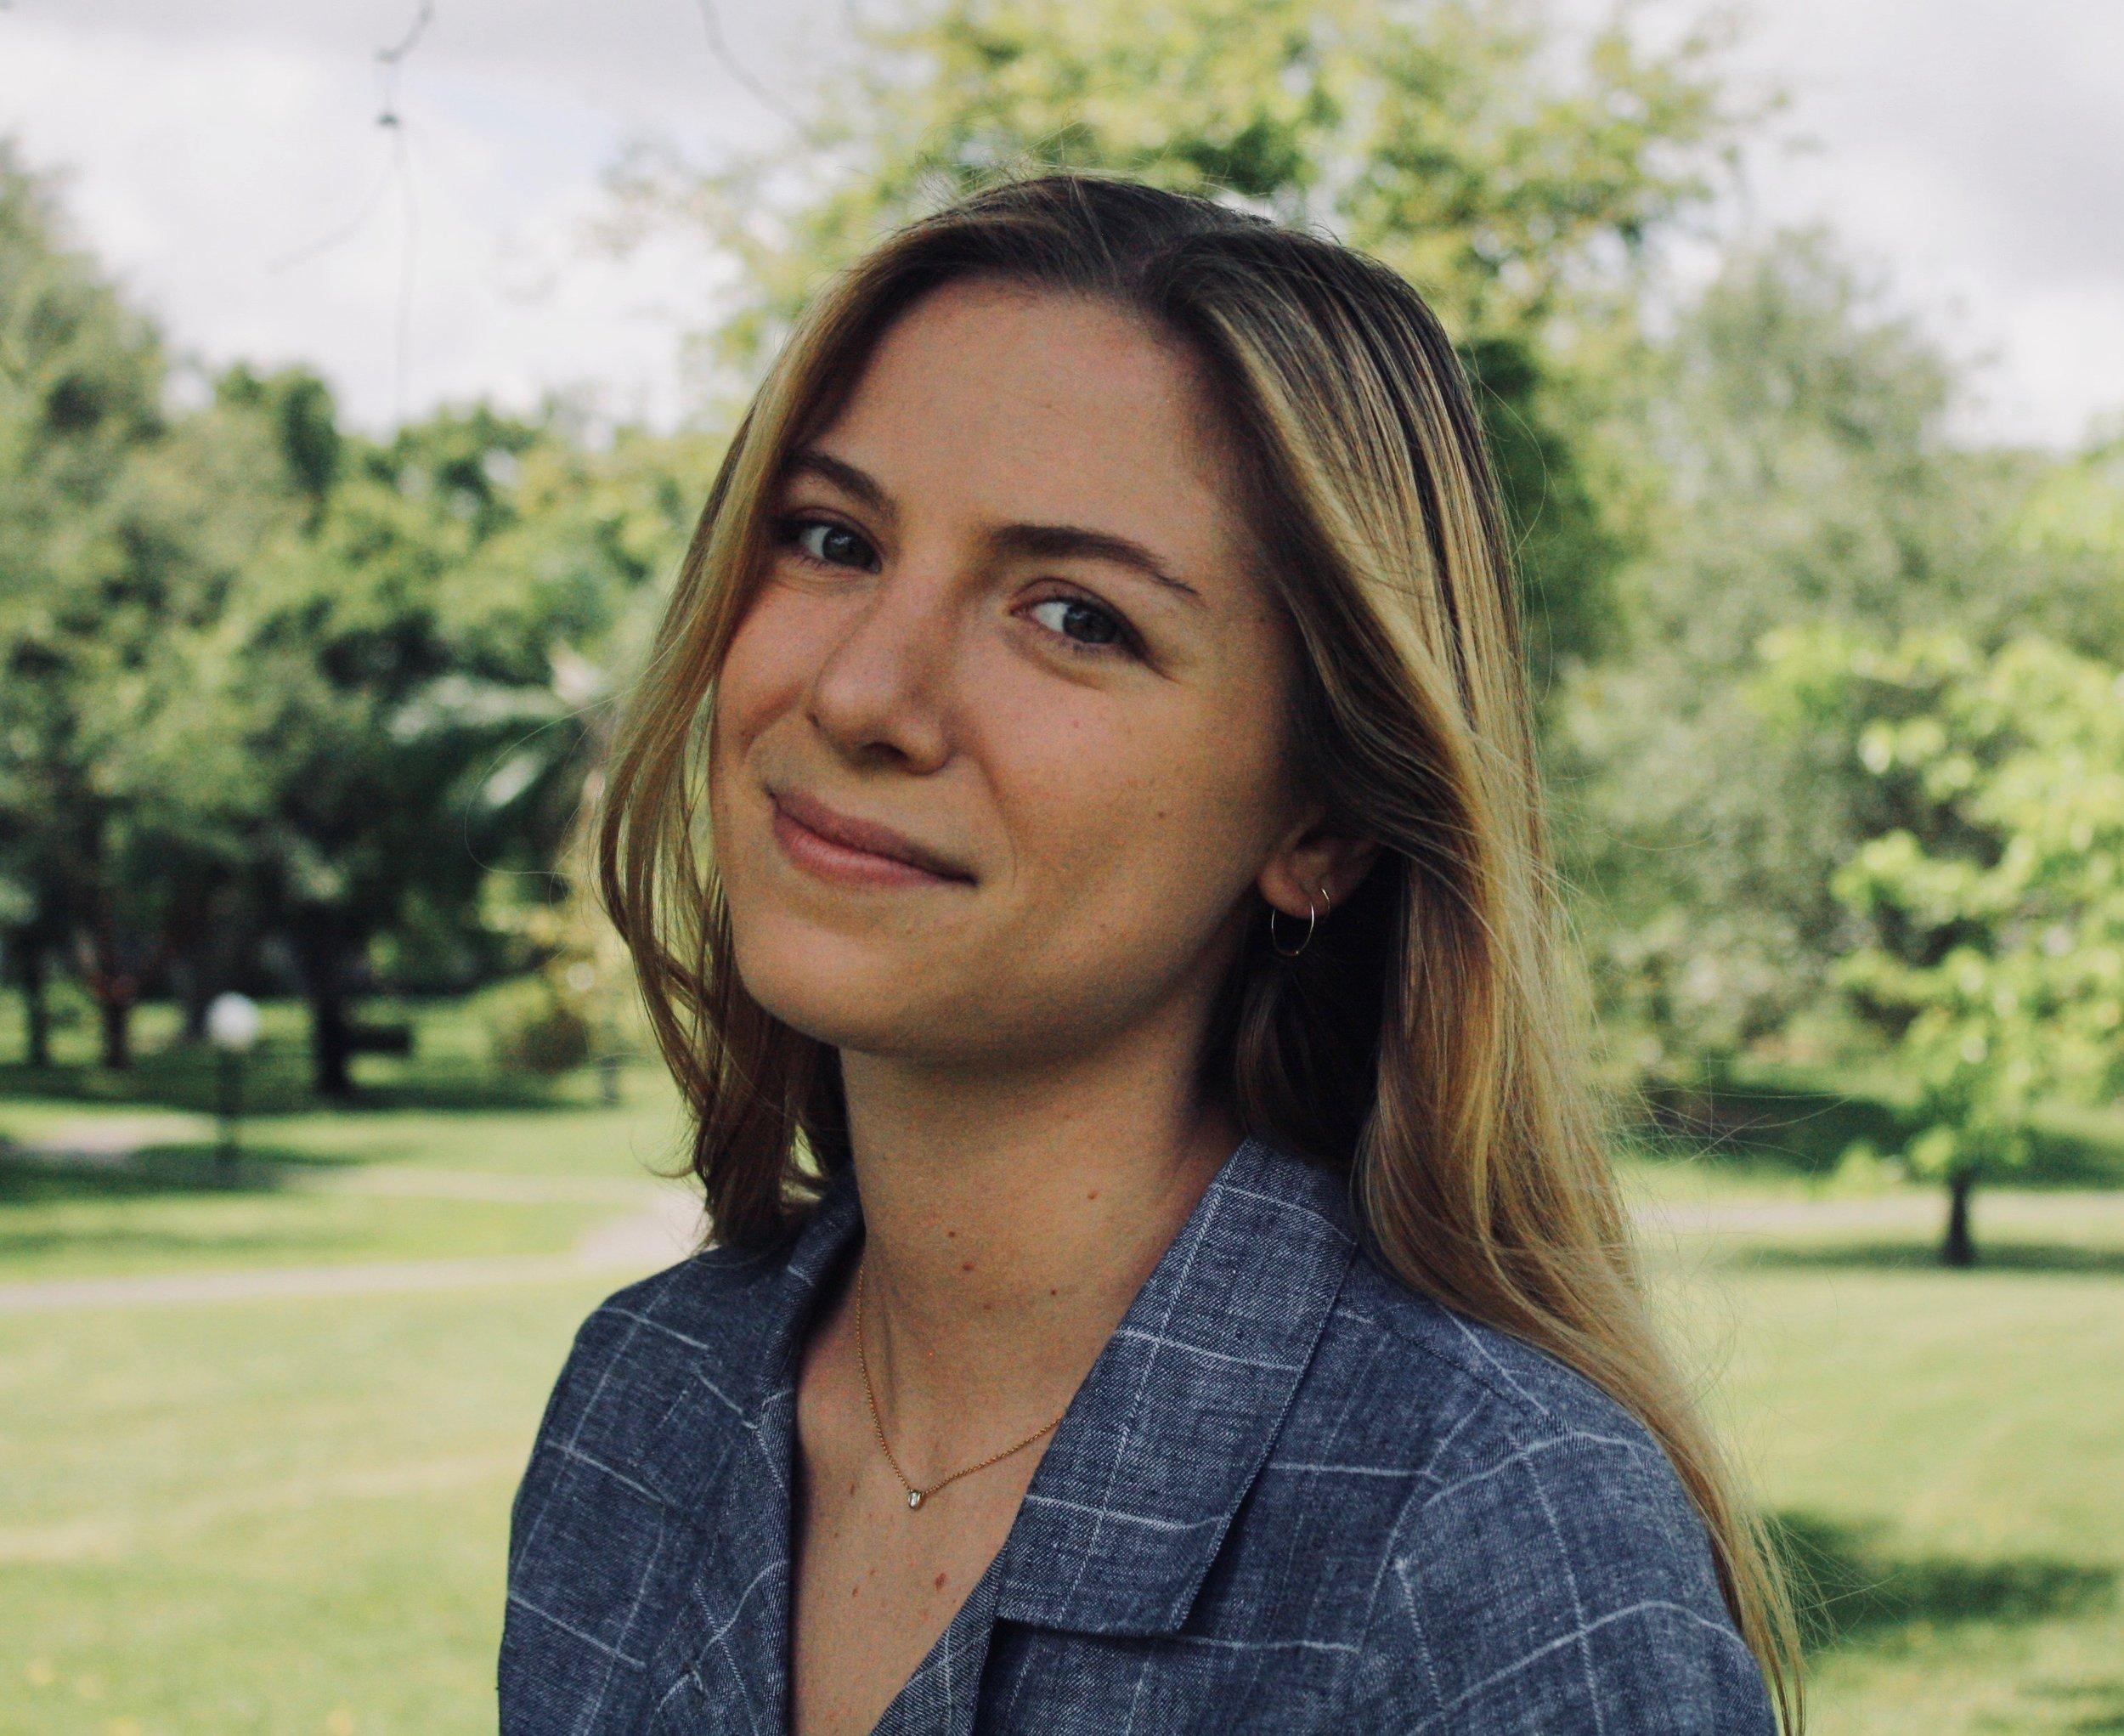 Juliette Delman-Lagot - Health Communications Specialist at Alliance for Healthy Communities